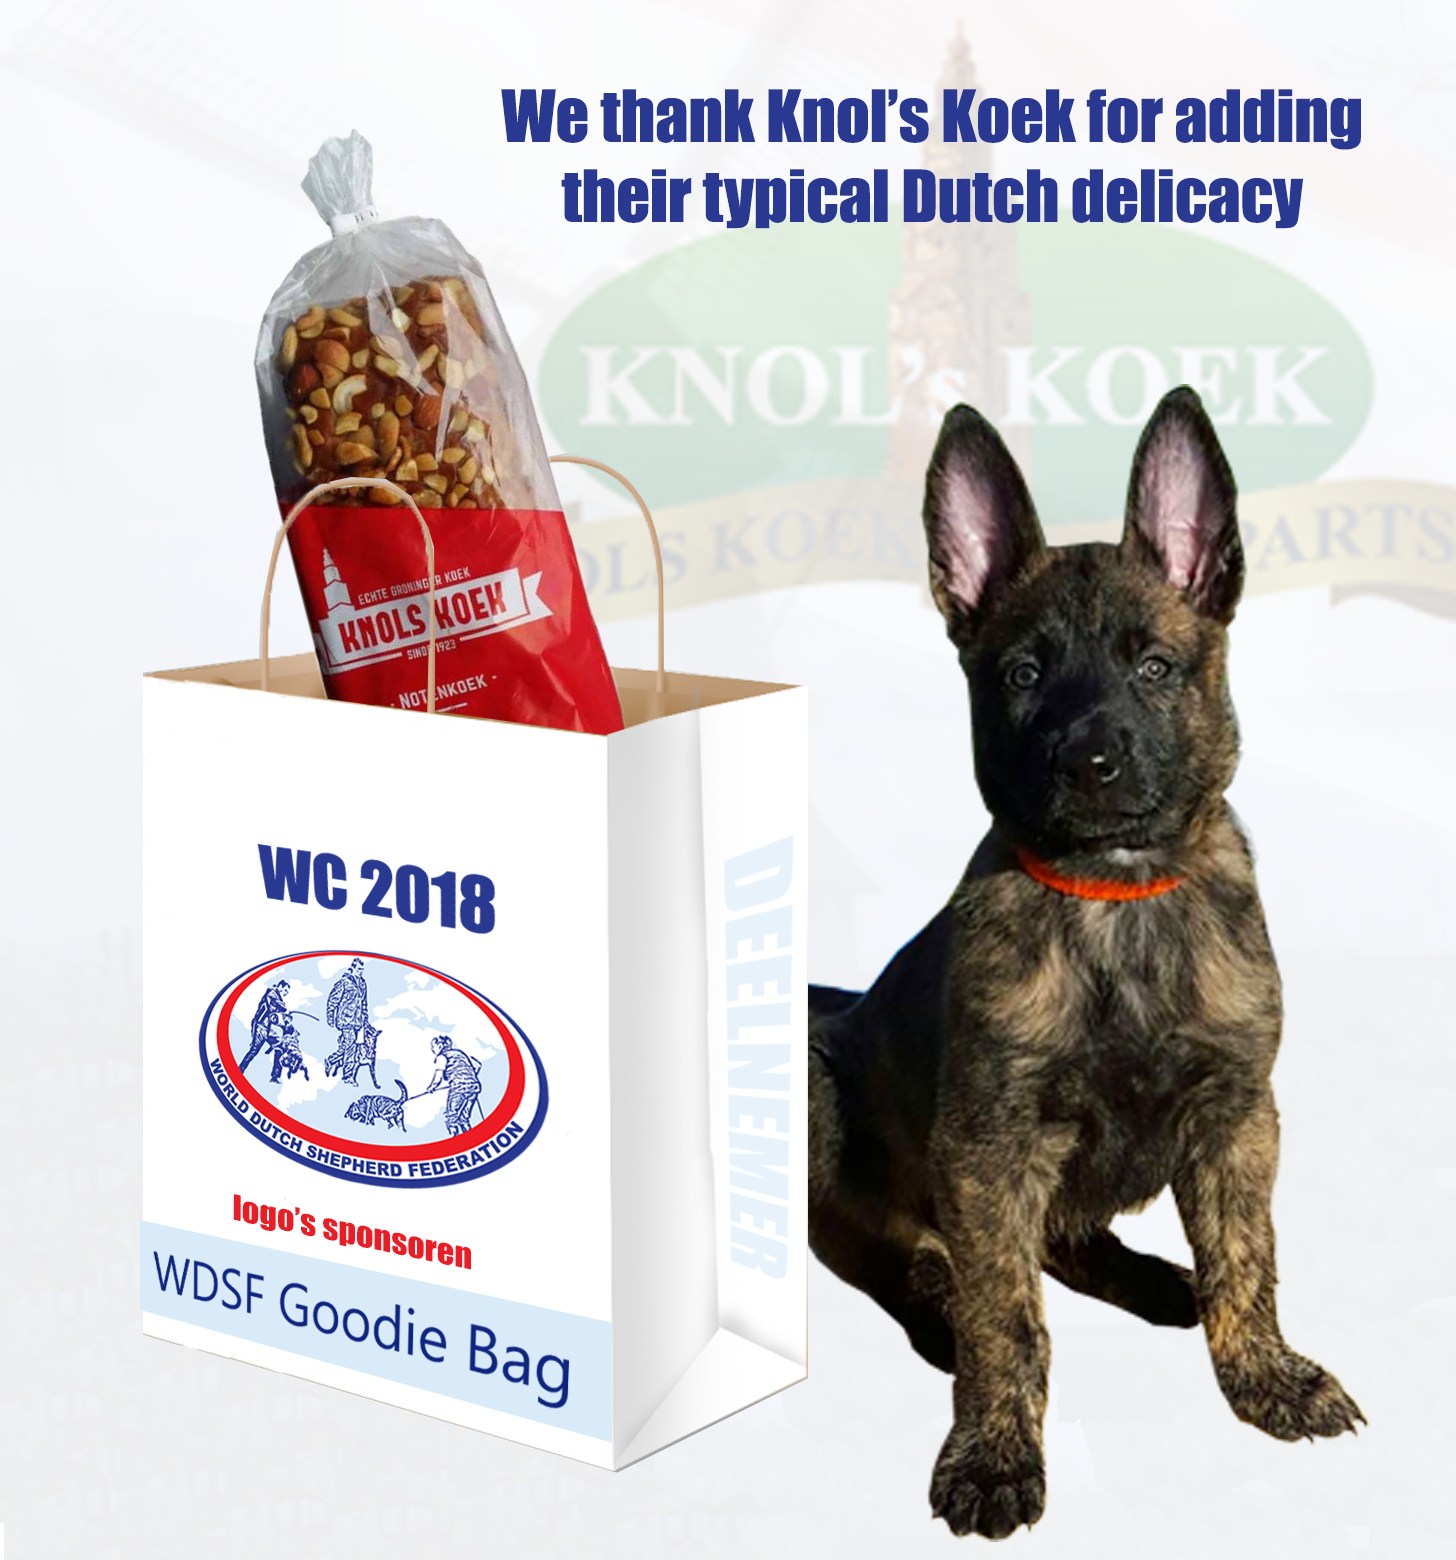 goodie bag knols koek thank you